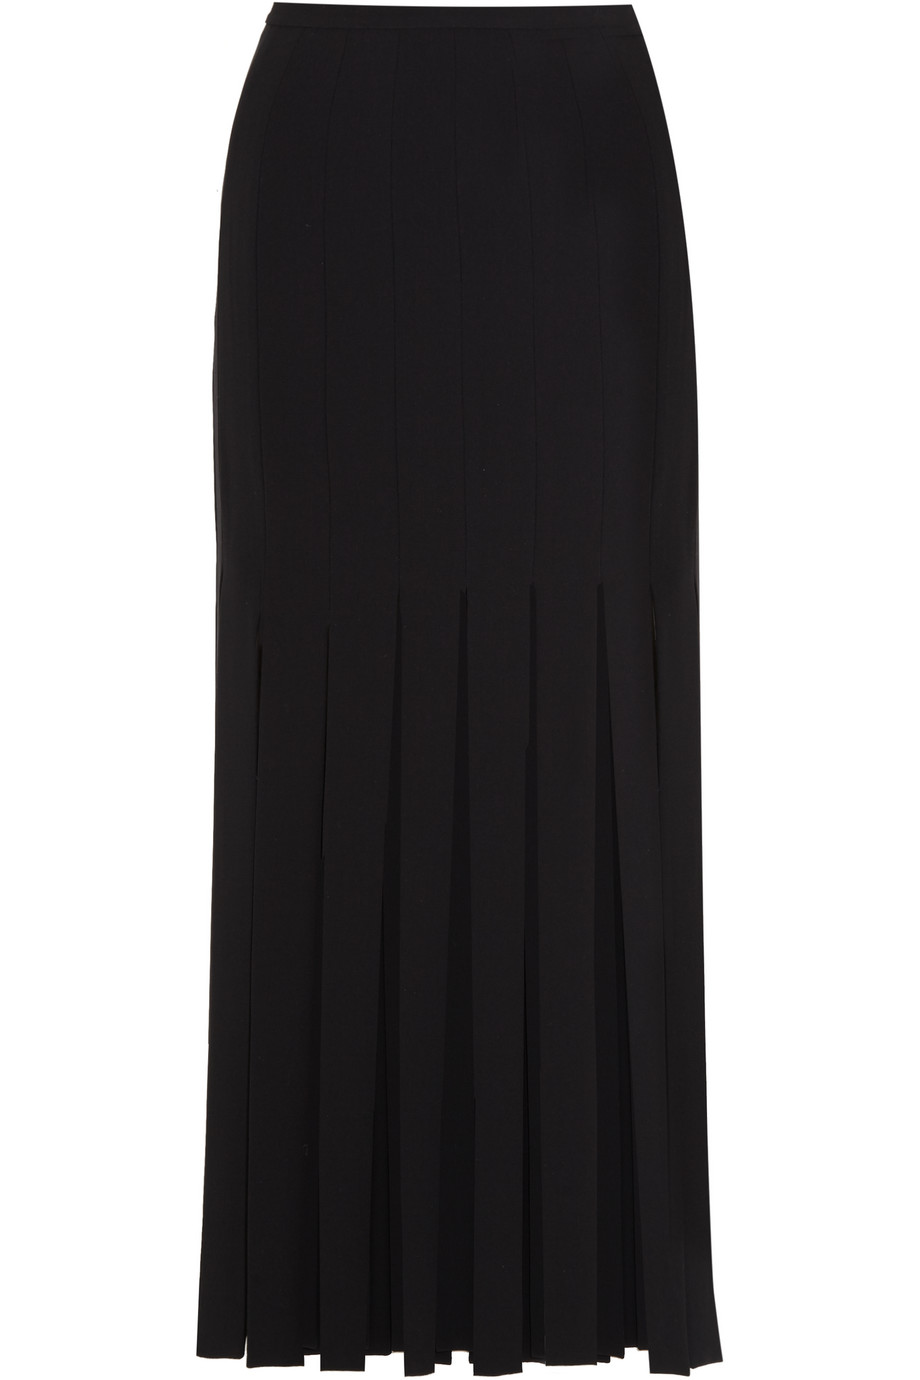 Tamara Mellon Fringed Stretch-Crepe Skirt, Black, Women's, Size: 4